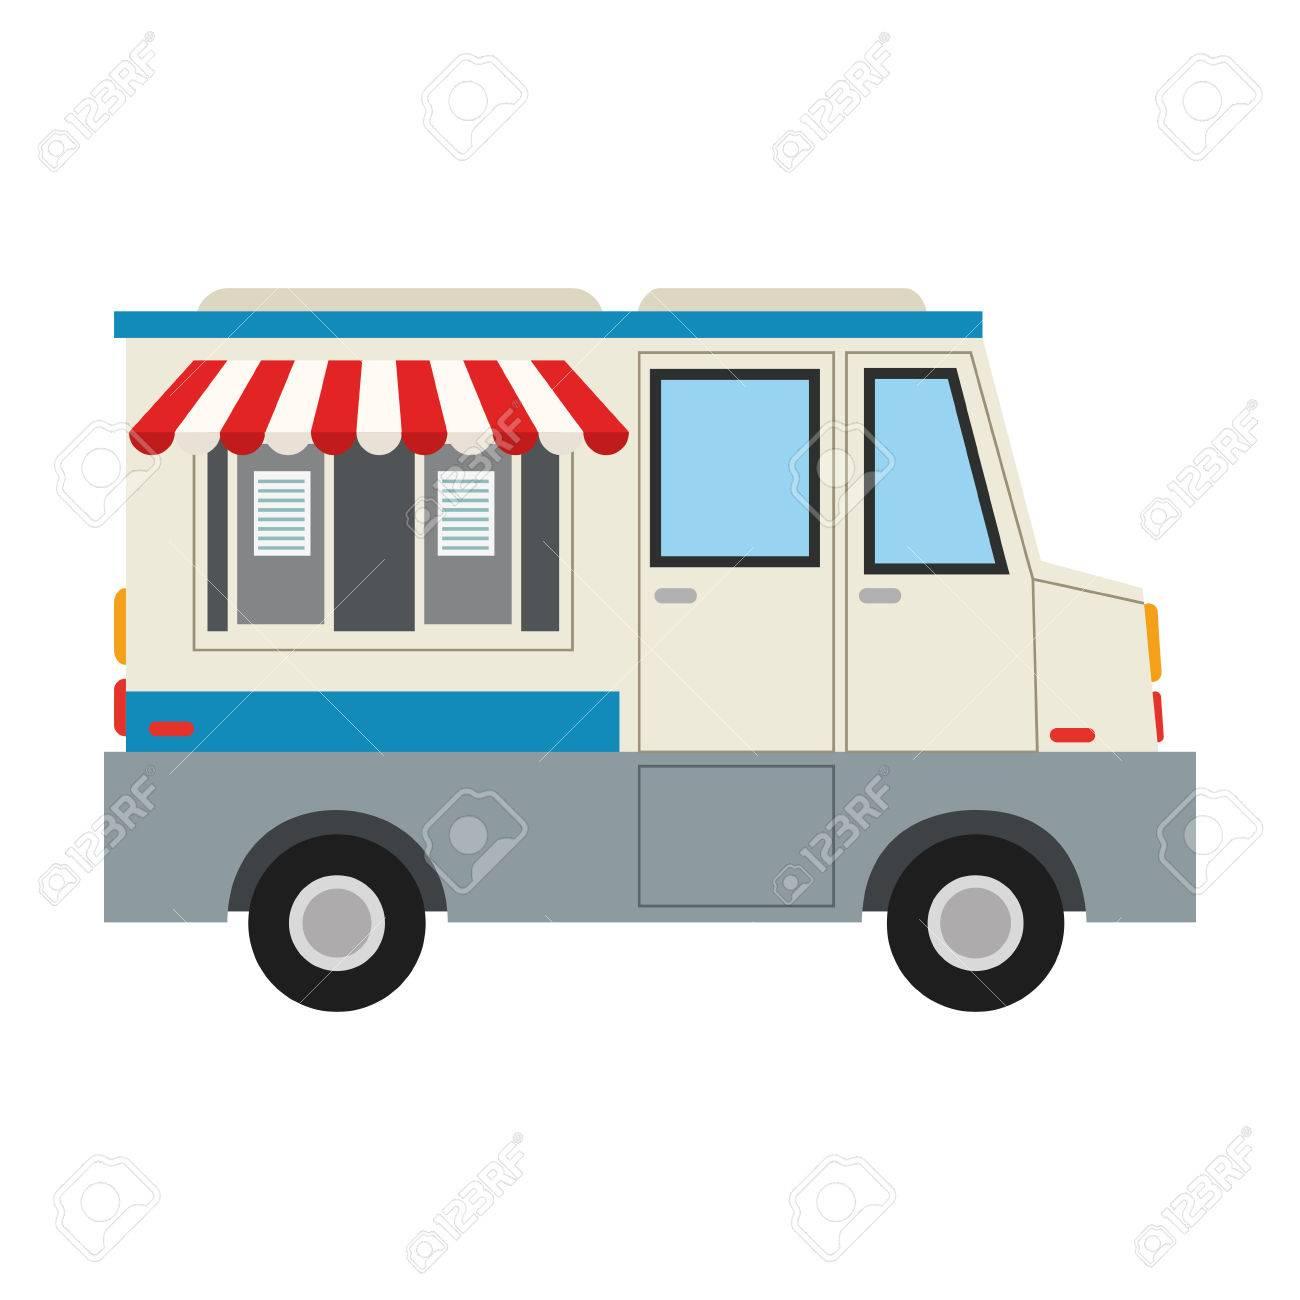 Food Truck Icon Image Vector Illustration Design Stock